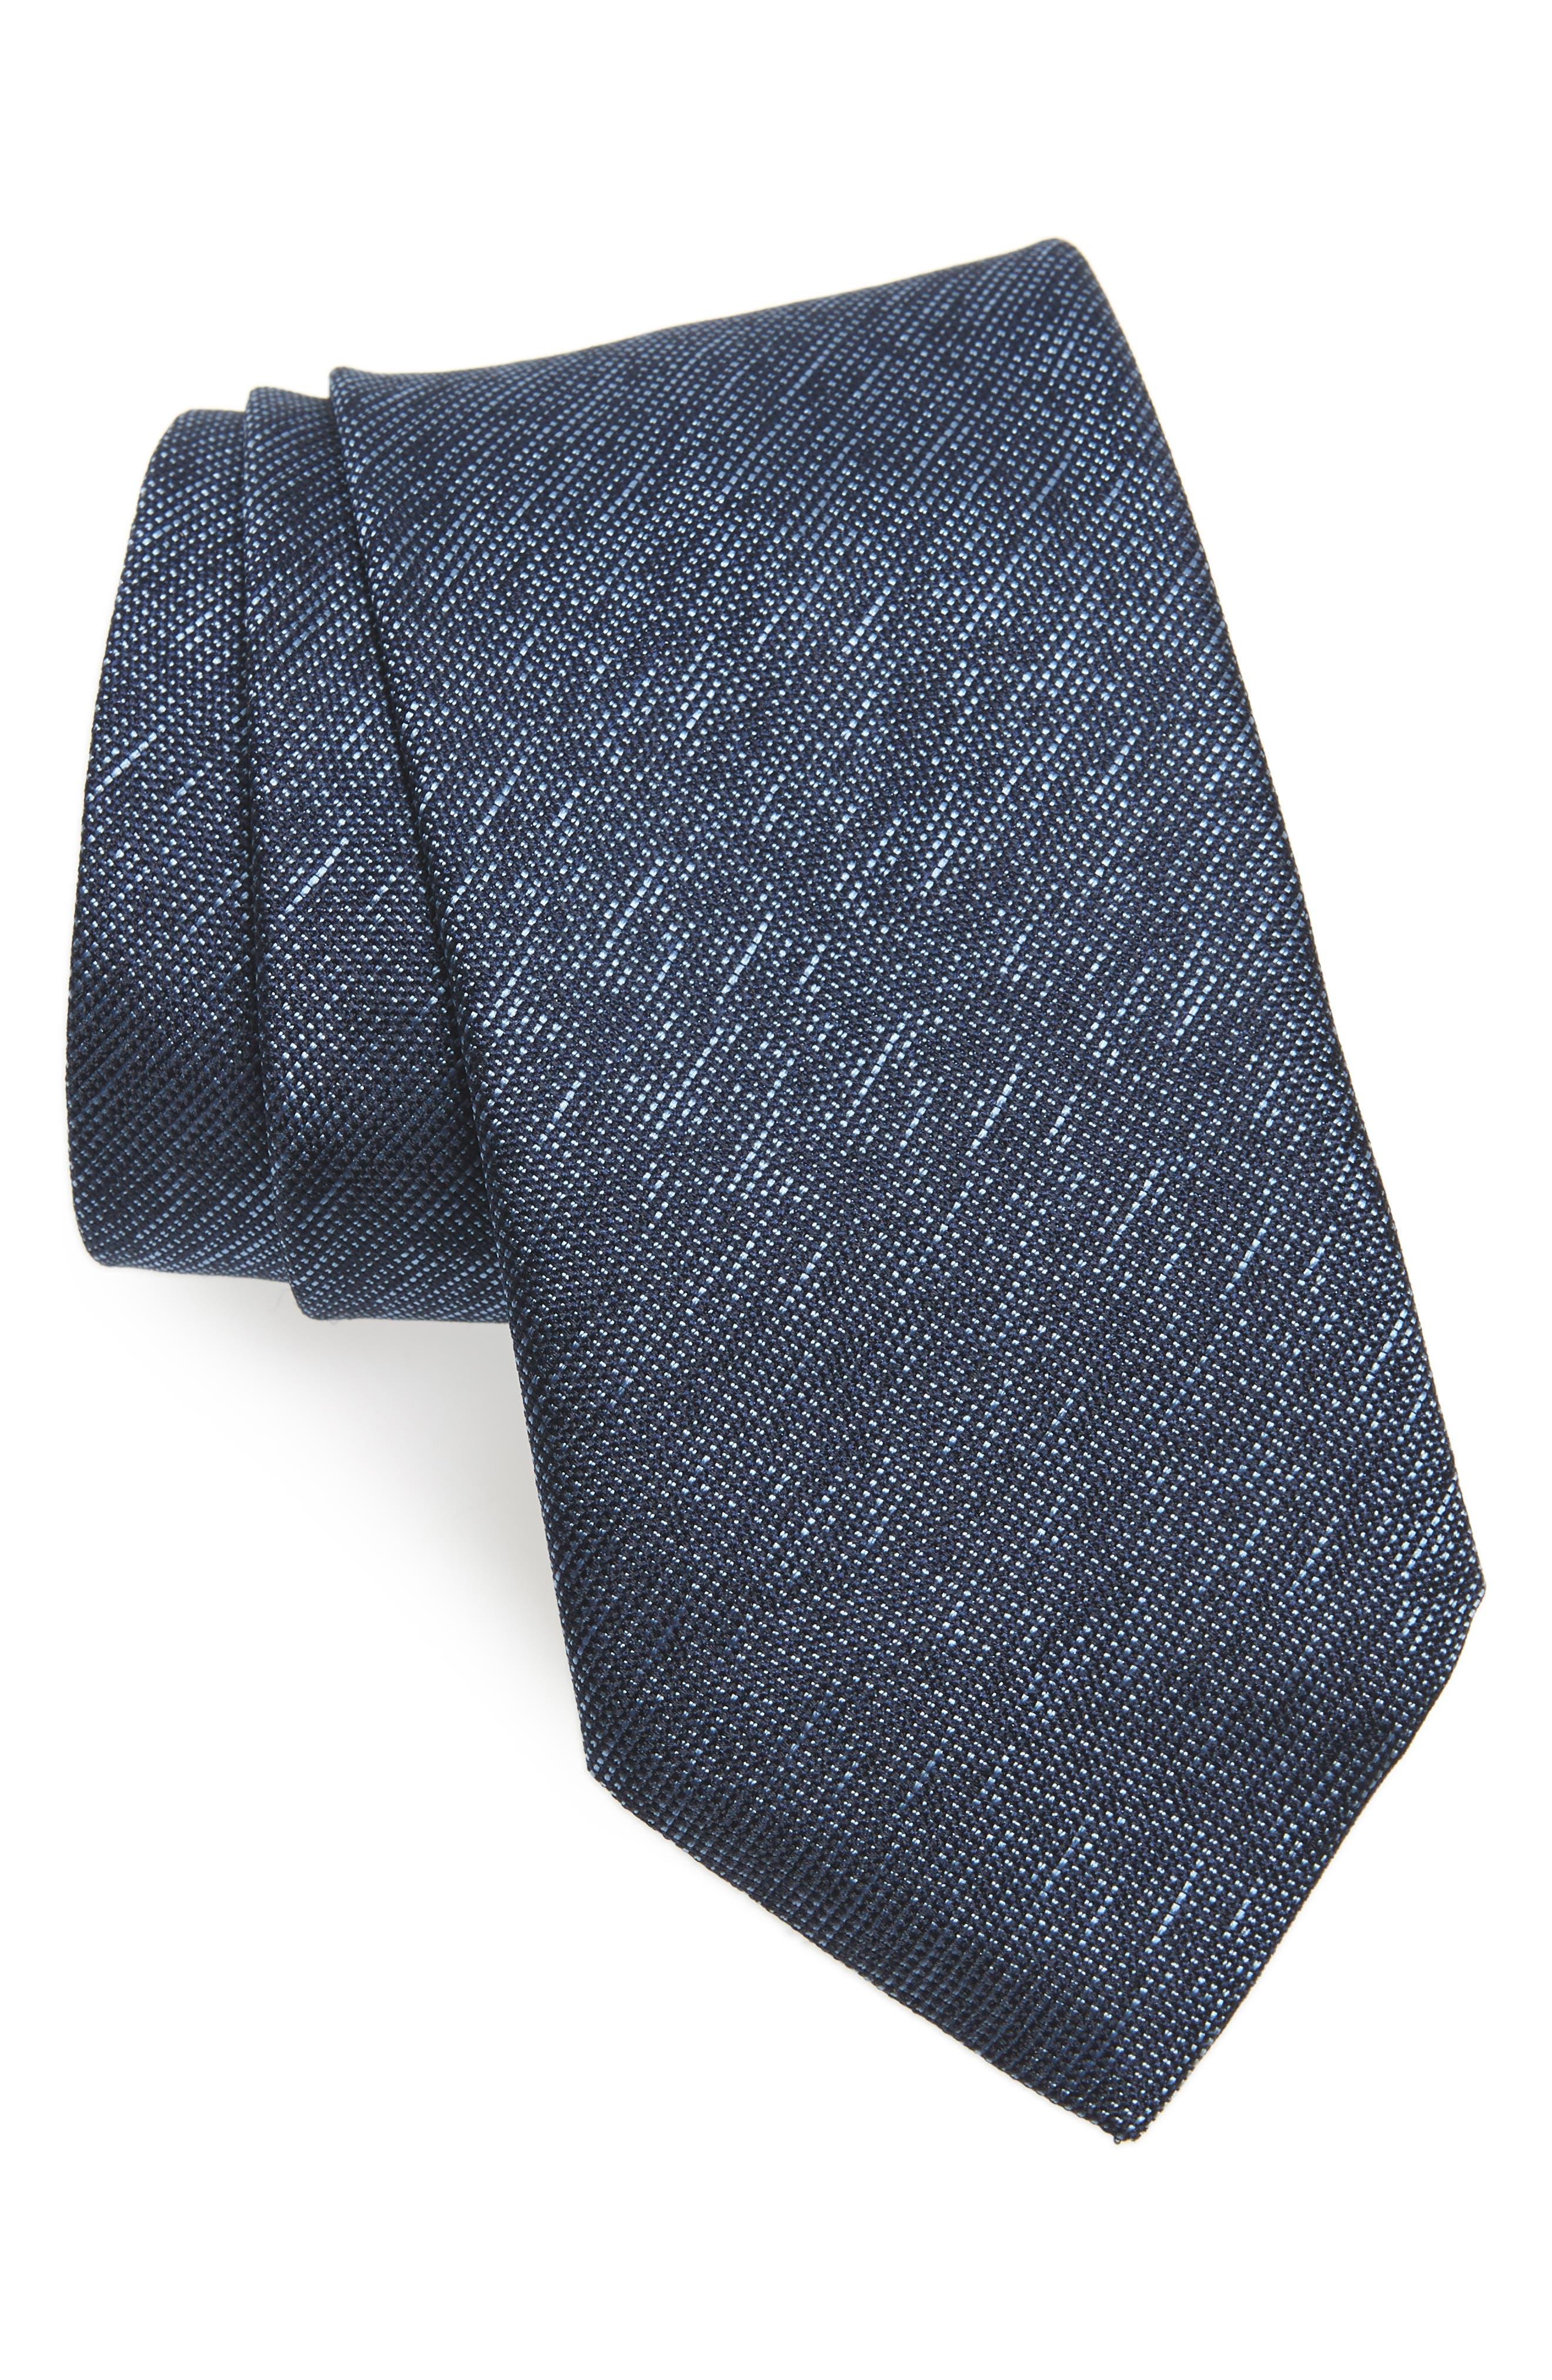 Solid Silk Tie,                             Main thumbnail 1, color,                             BLUE MARINE